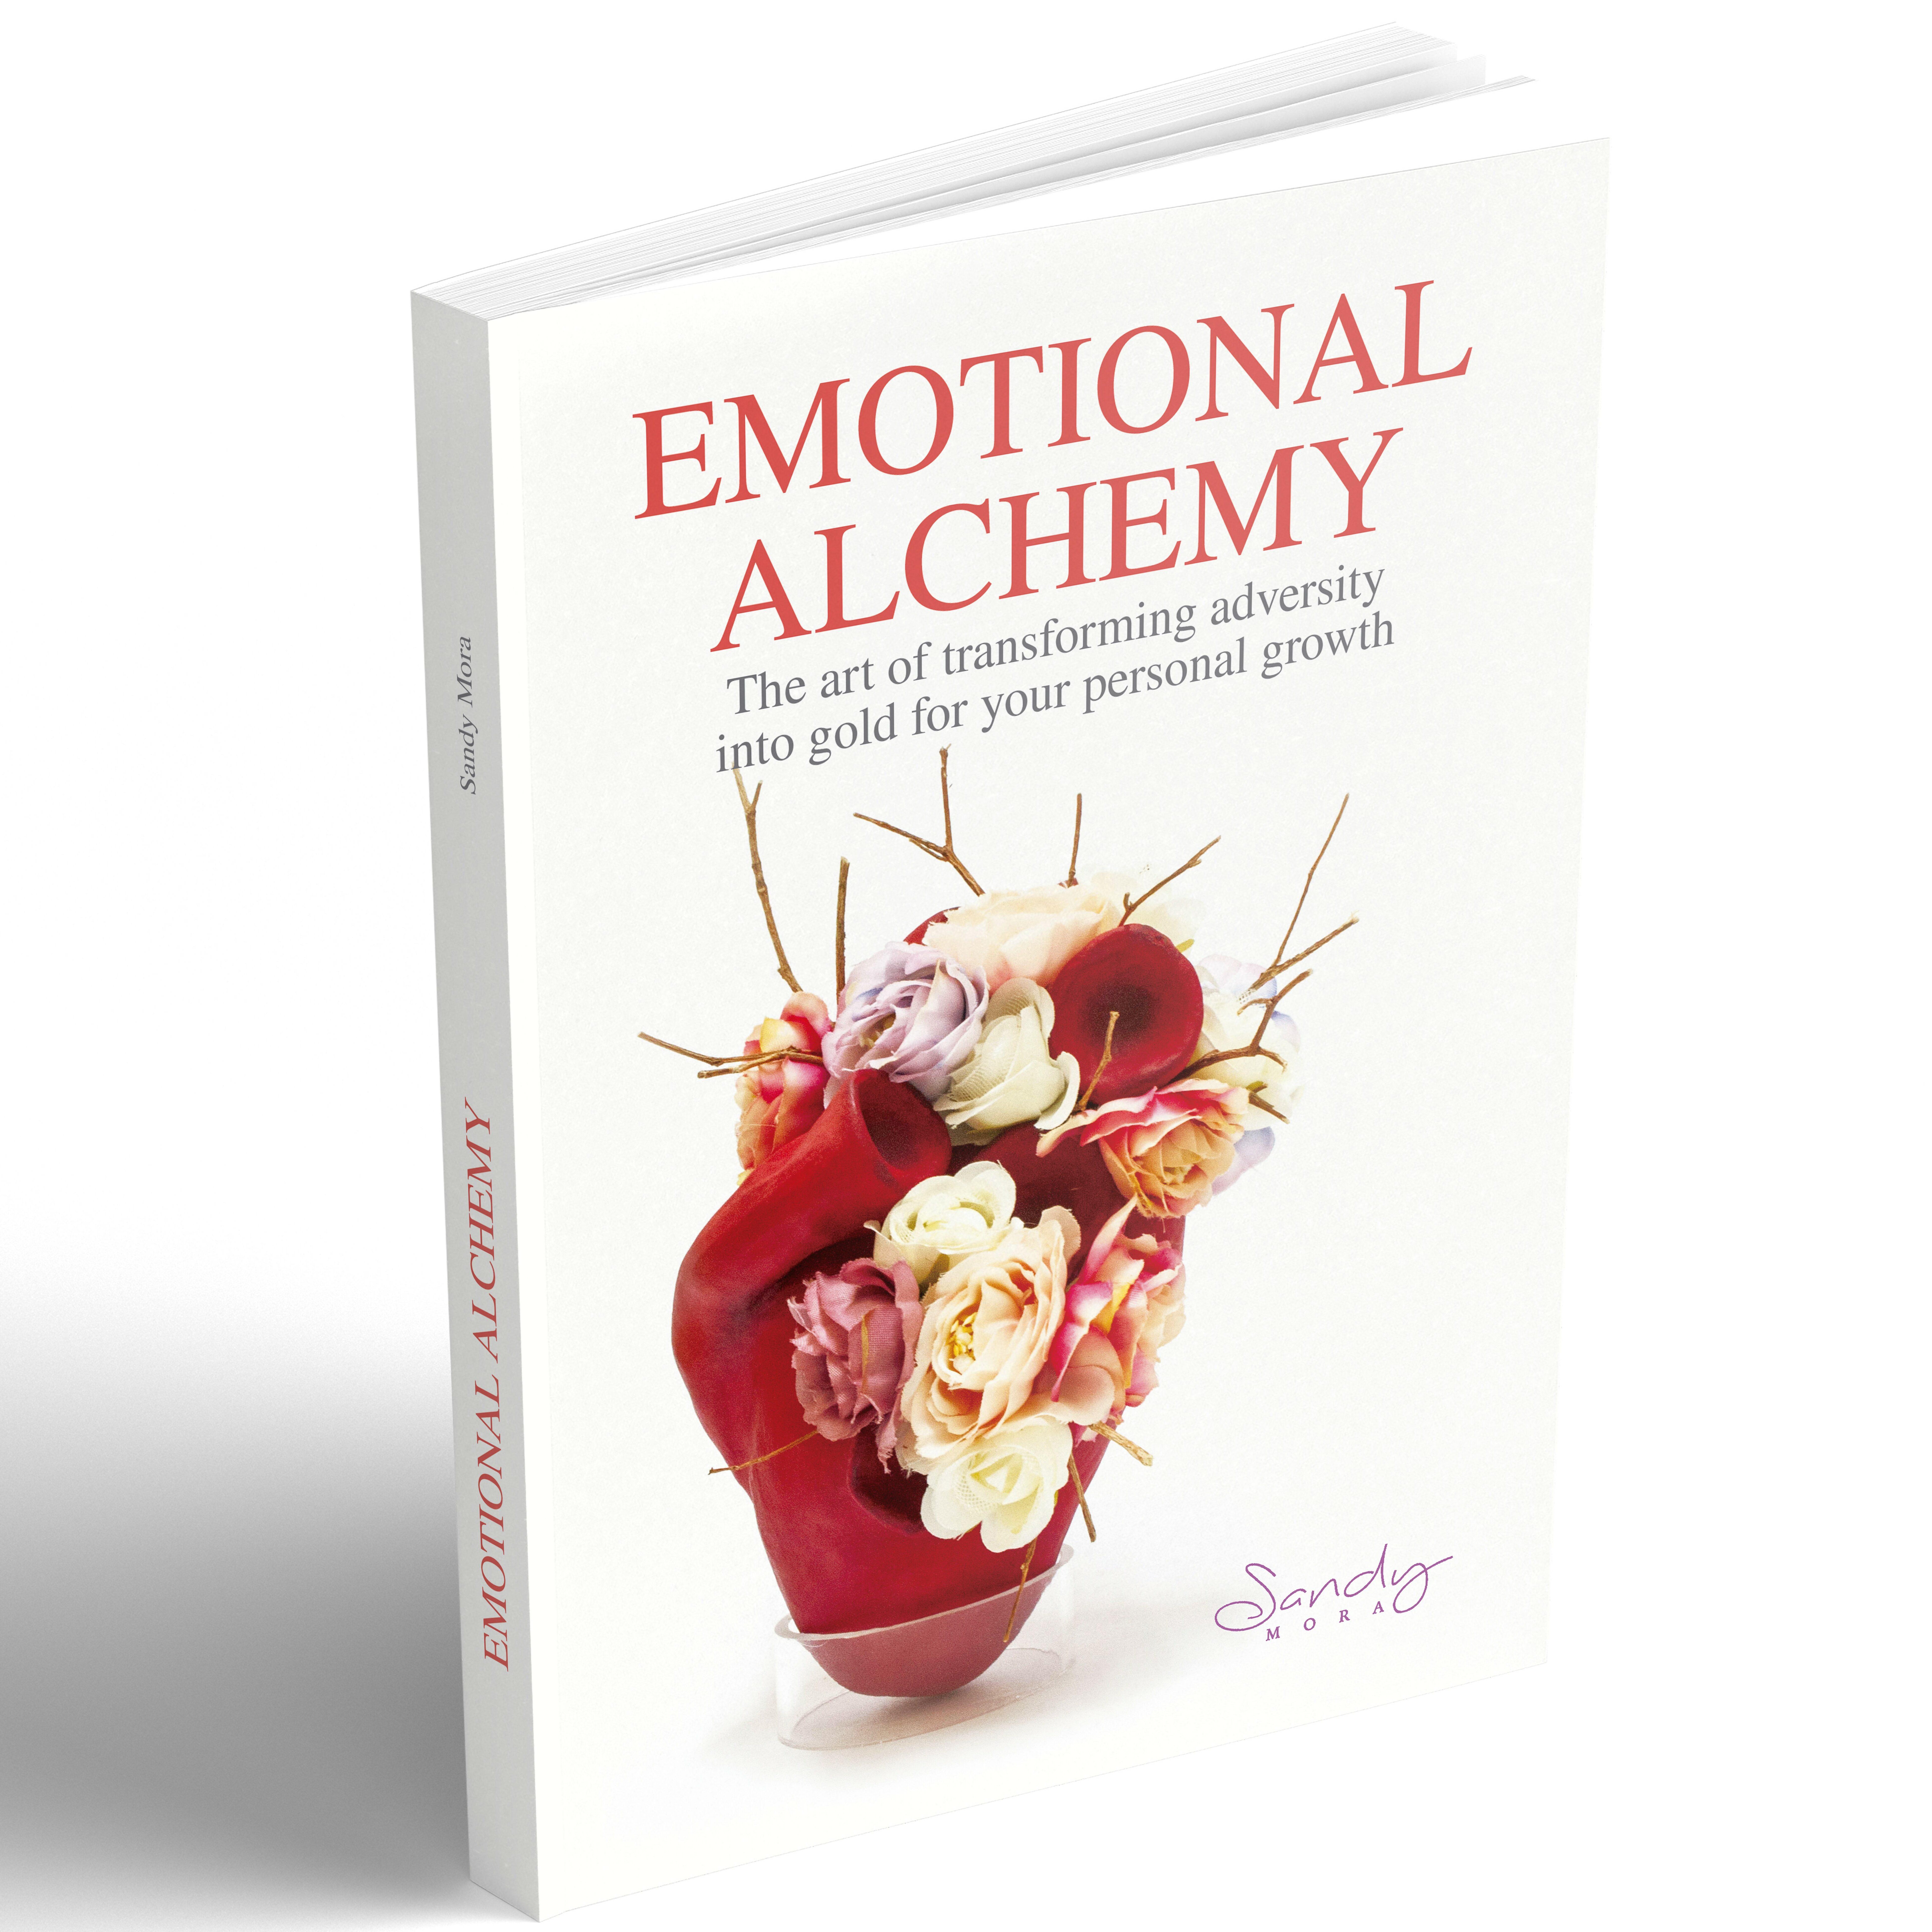 Emotional Alchemy by Sandy Mora